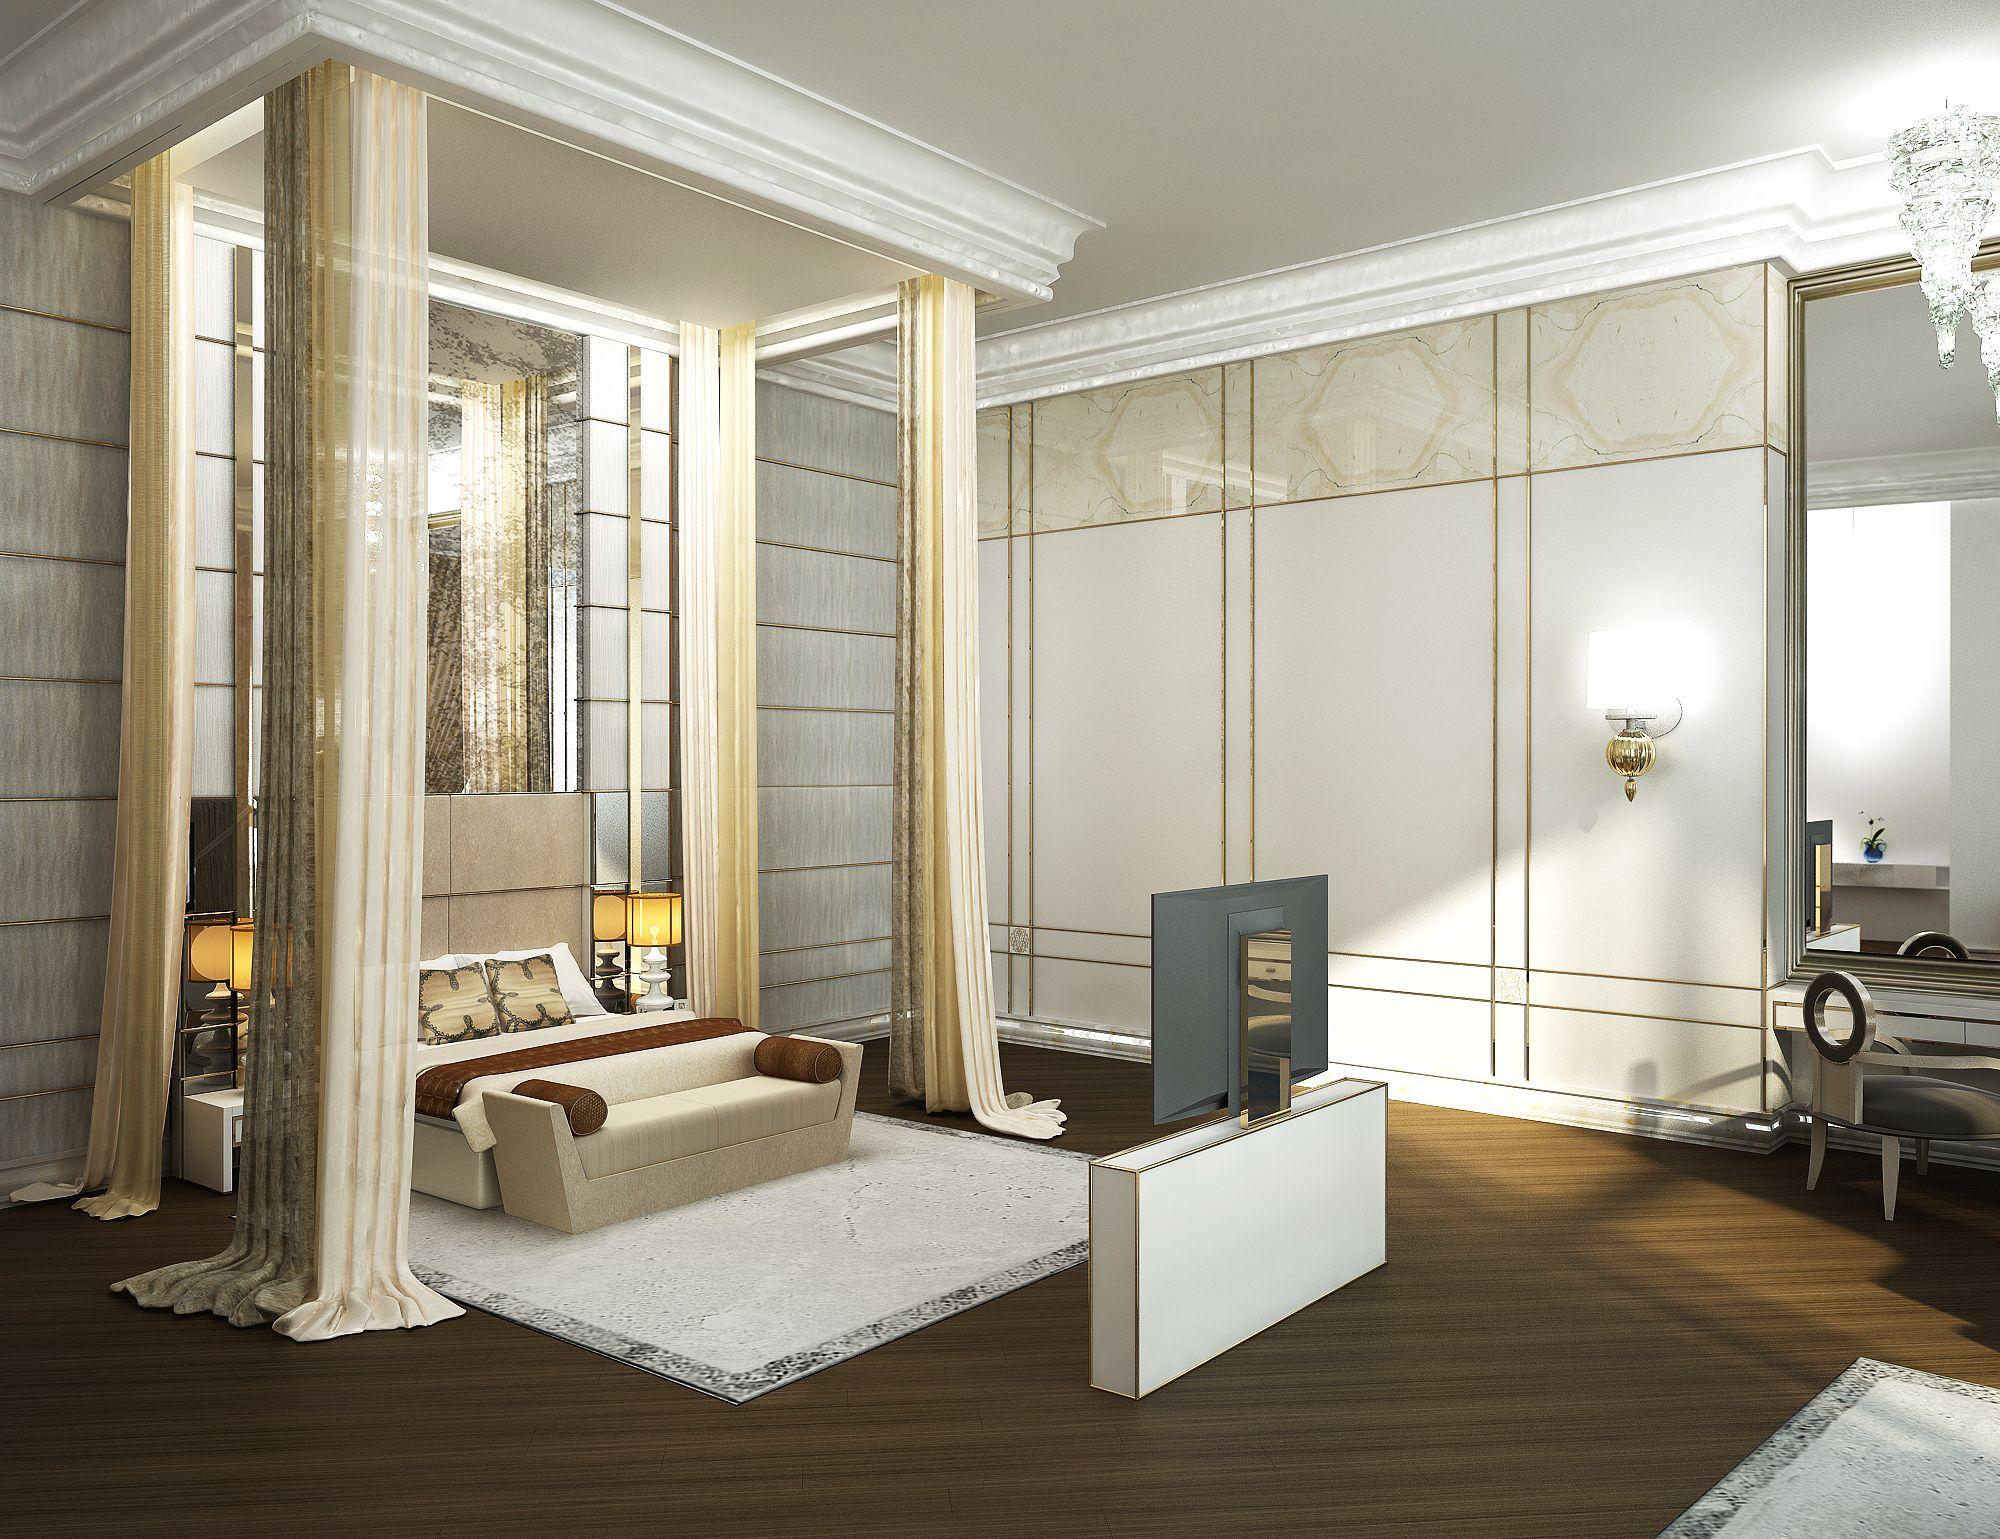 Best Master Suite Master Bedroom Royal Suite Bedroom Luxury 400 x 300